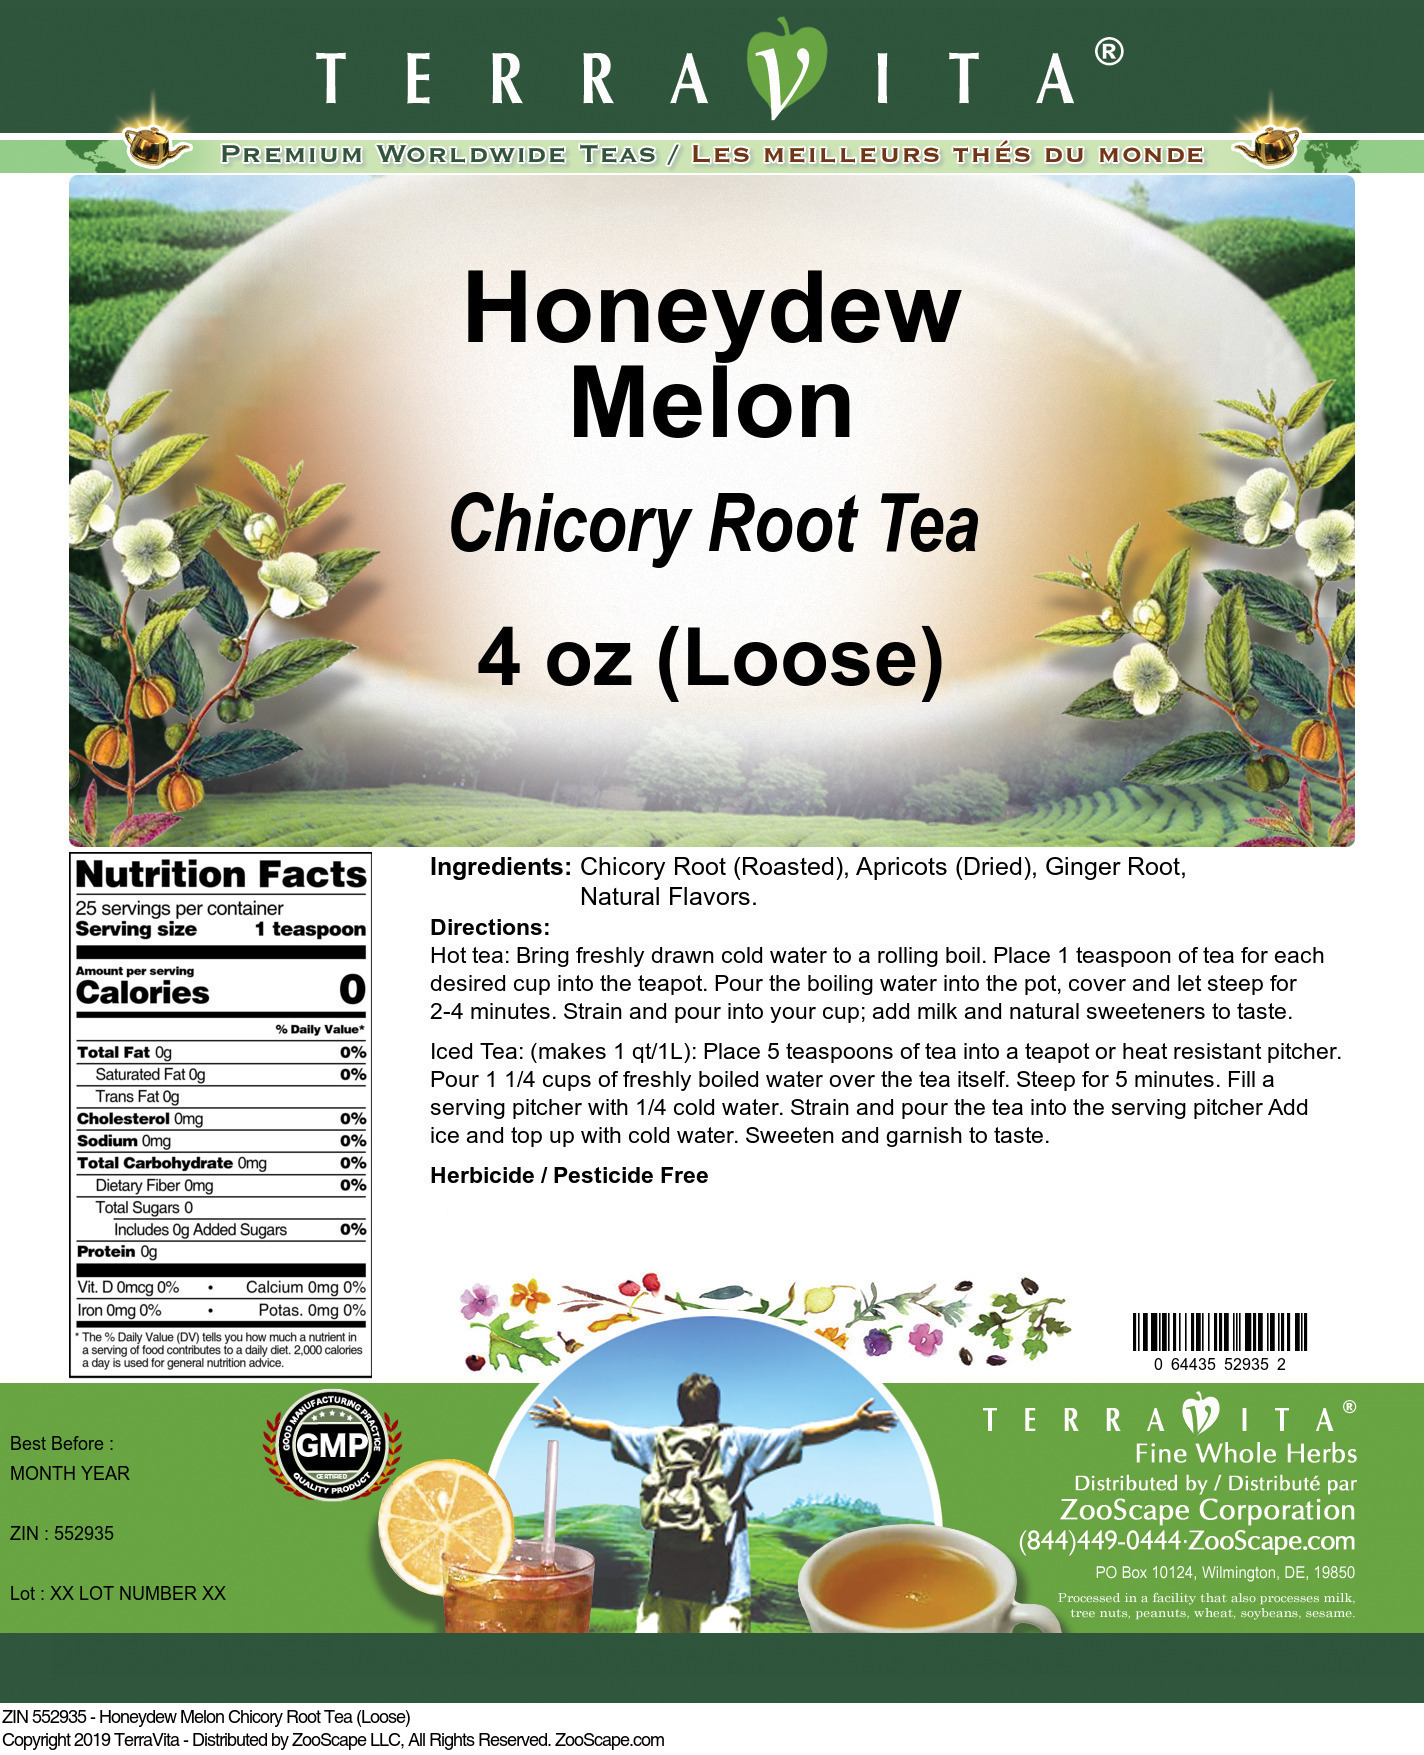 Honeydew Melon Chicory Root Tea (Loose)